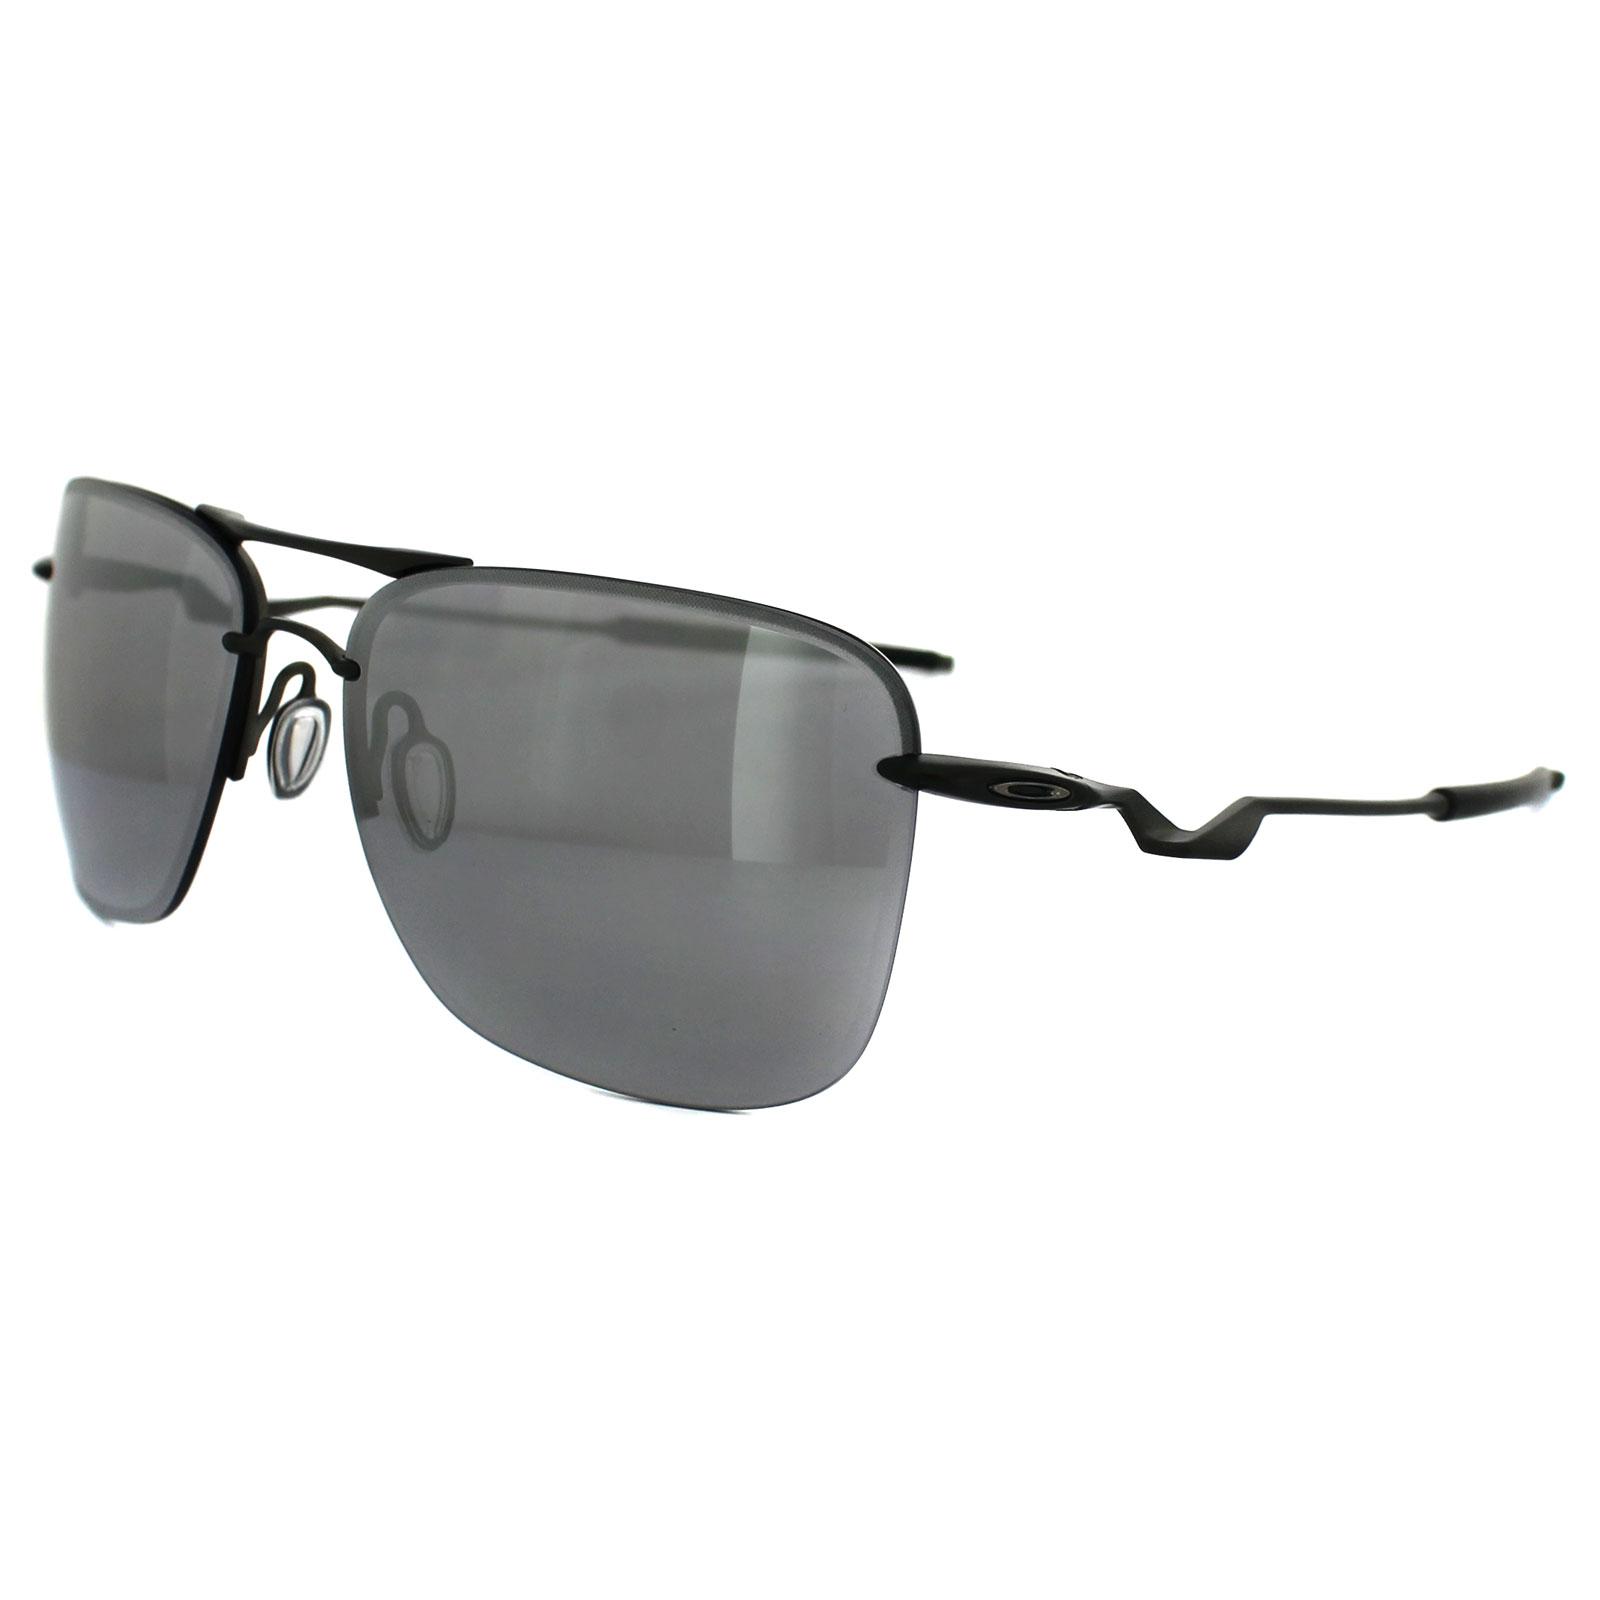 279643f24471a Sentinel Oakley Sunglasses Tailhook OO4087-02 Carbon Chrome Iridium